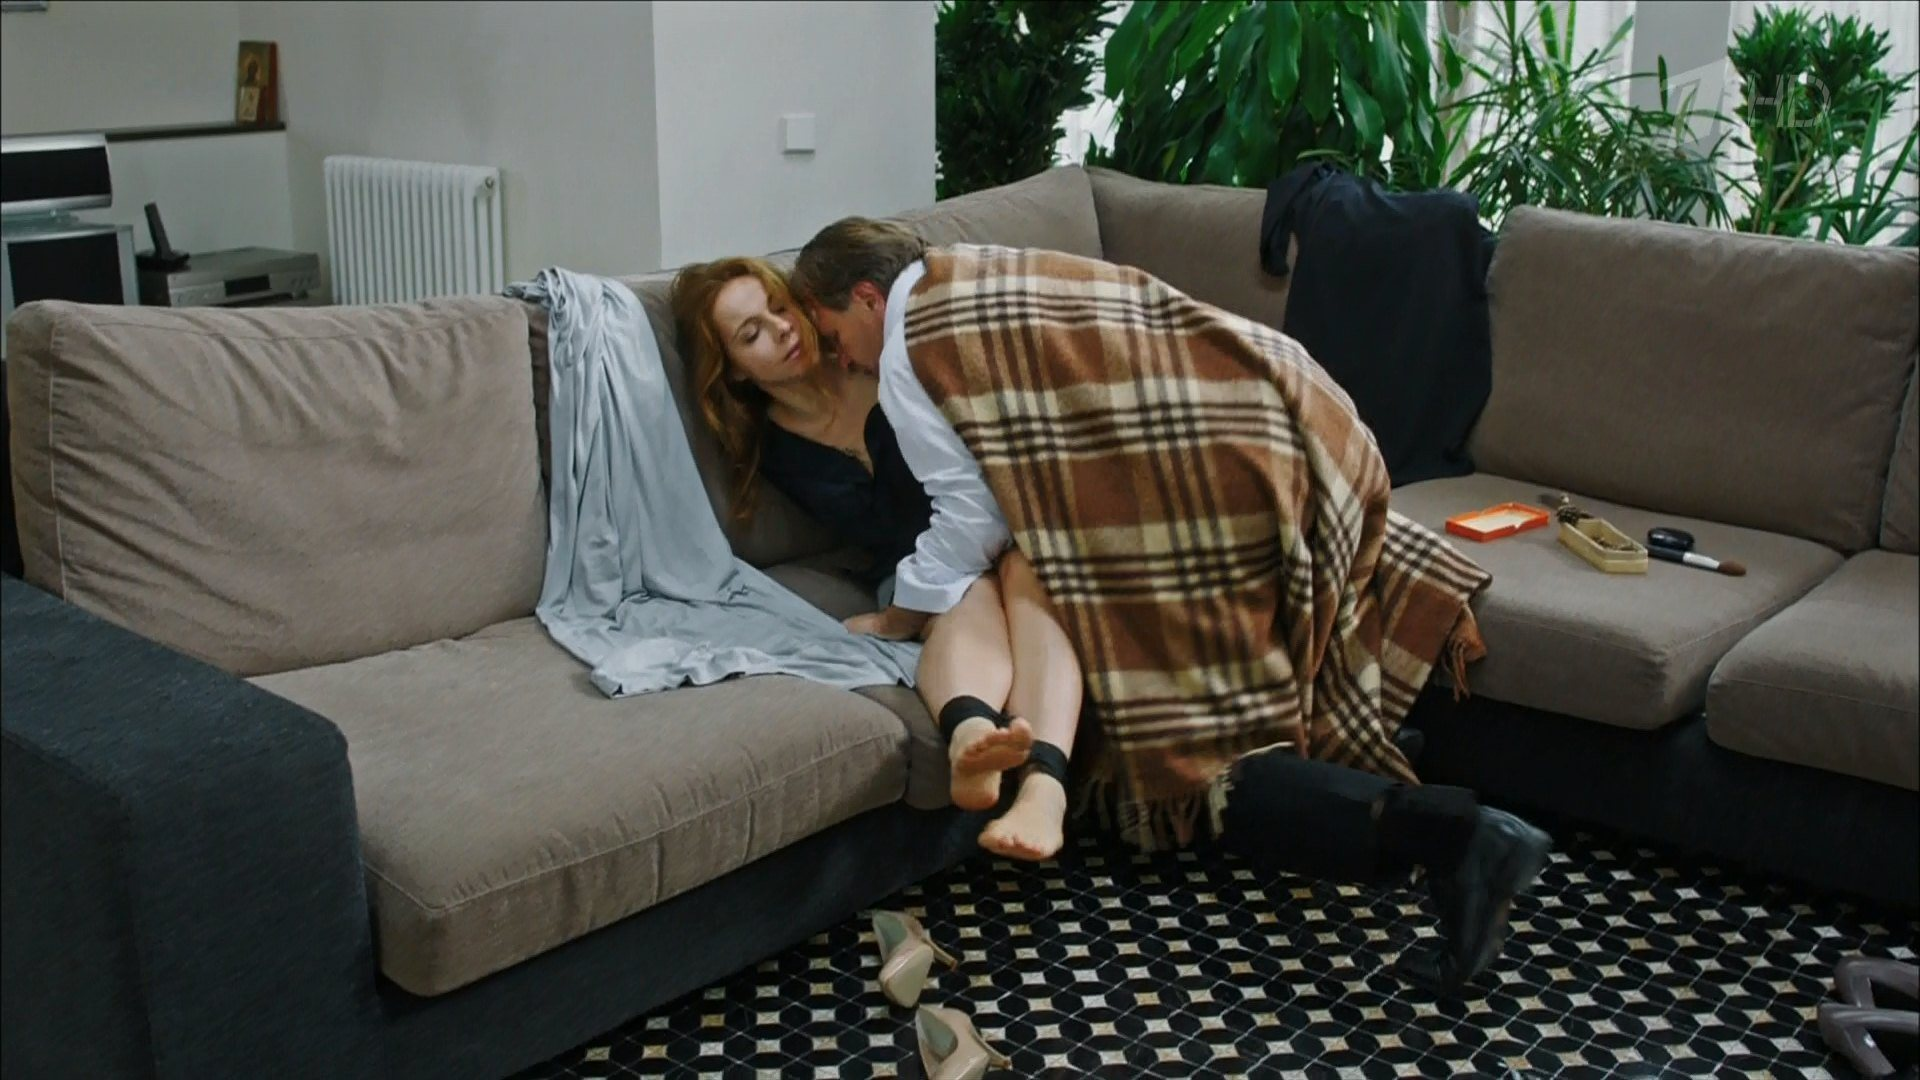 https://pics.wikifeet.com/Ekaterina-Guseva-Feet-2458006.jpg